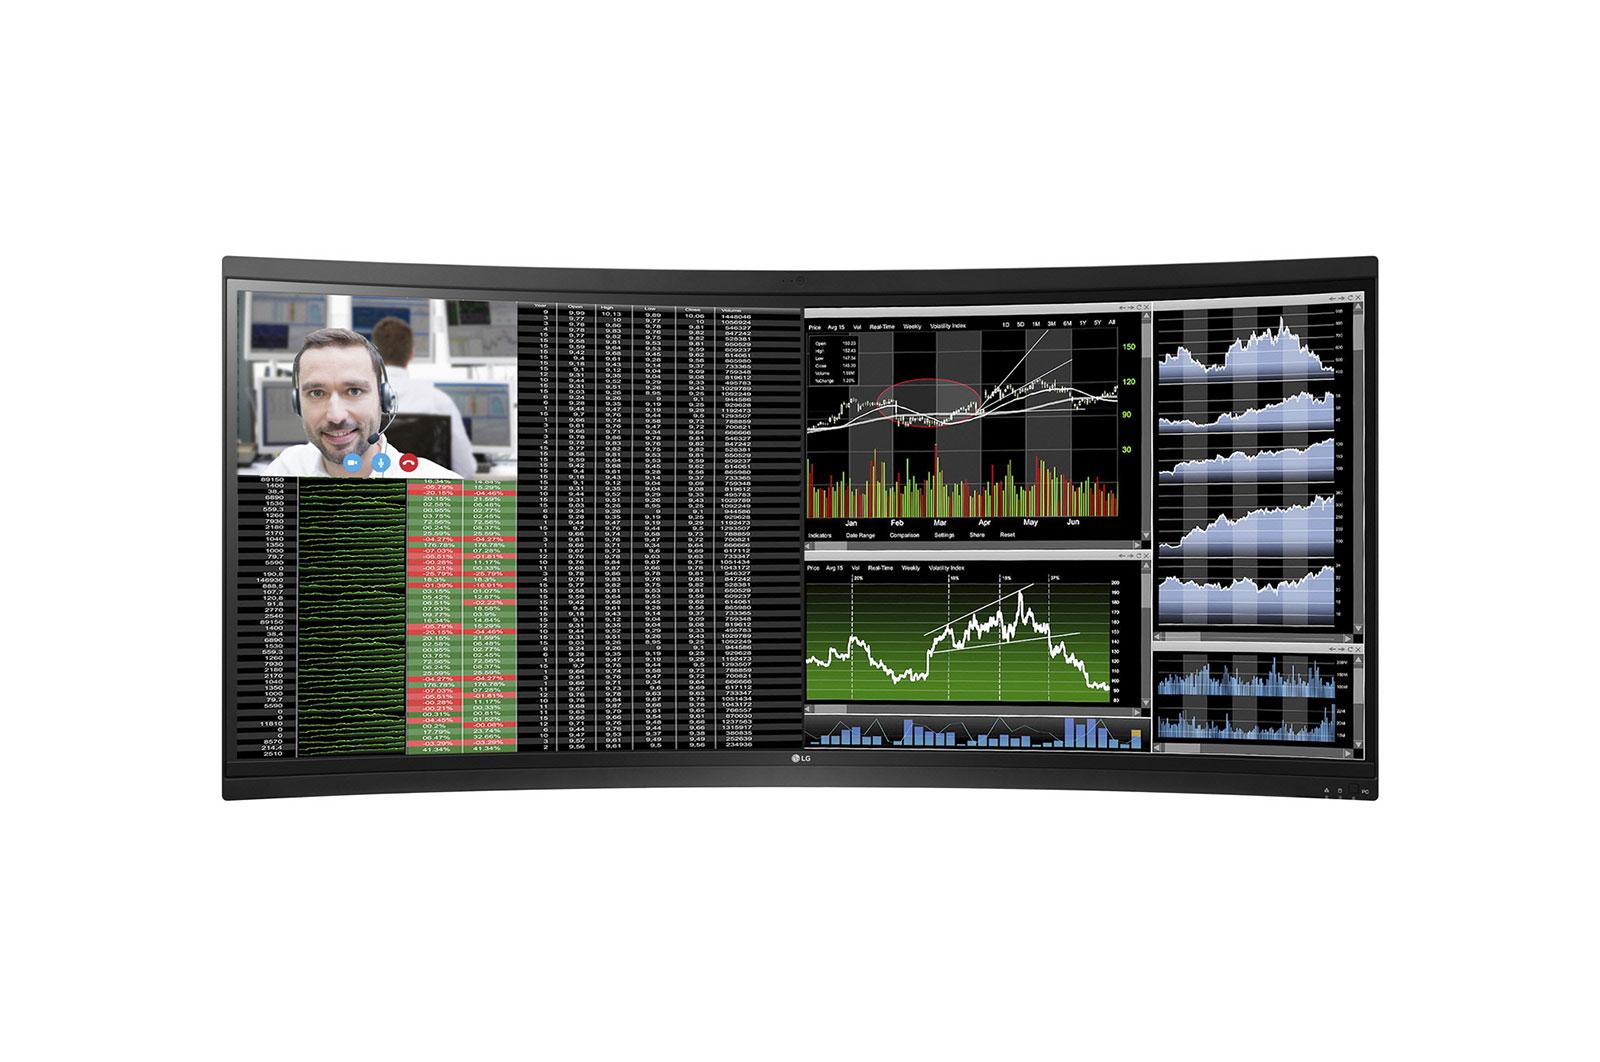 LG - Monitor 38P 38CK900N-1C IPS ThinClient Display